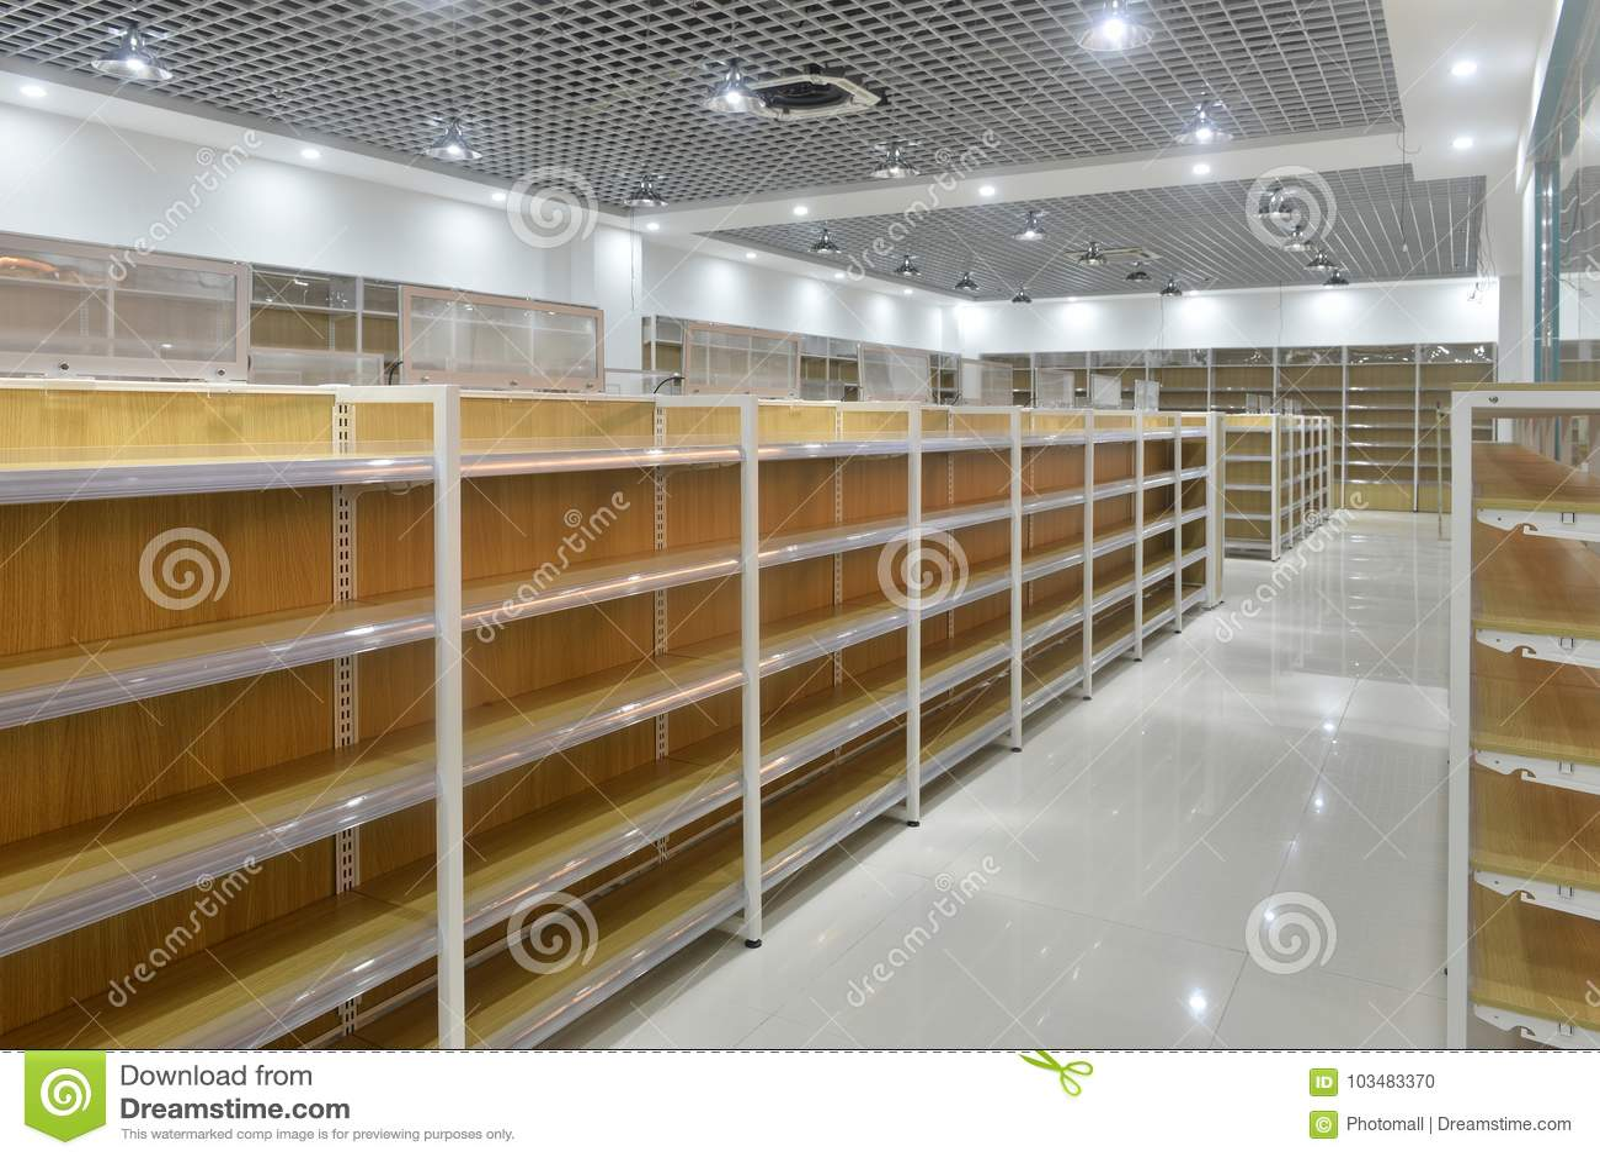 Empty shelves of supermarket interior